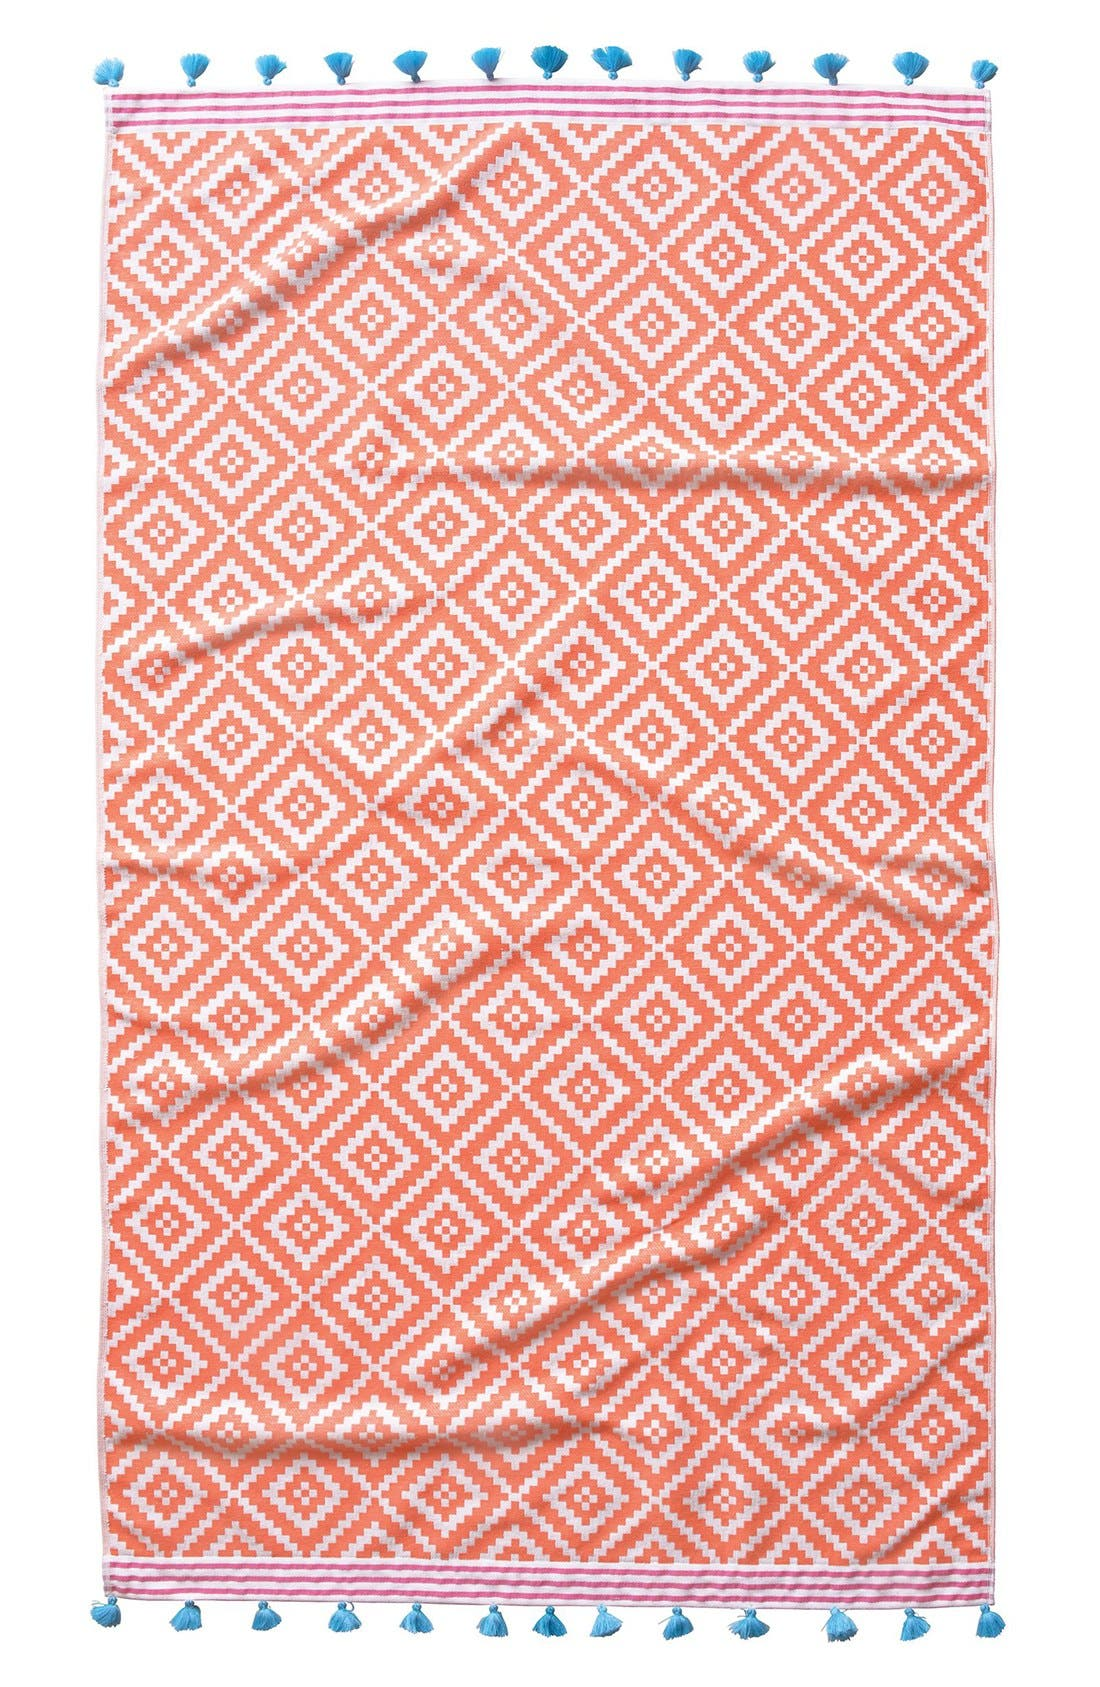 'Alabat' Beach Towel,                             Main thumbnail 1, color,                             950